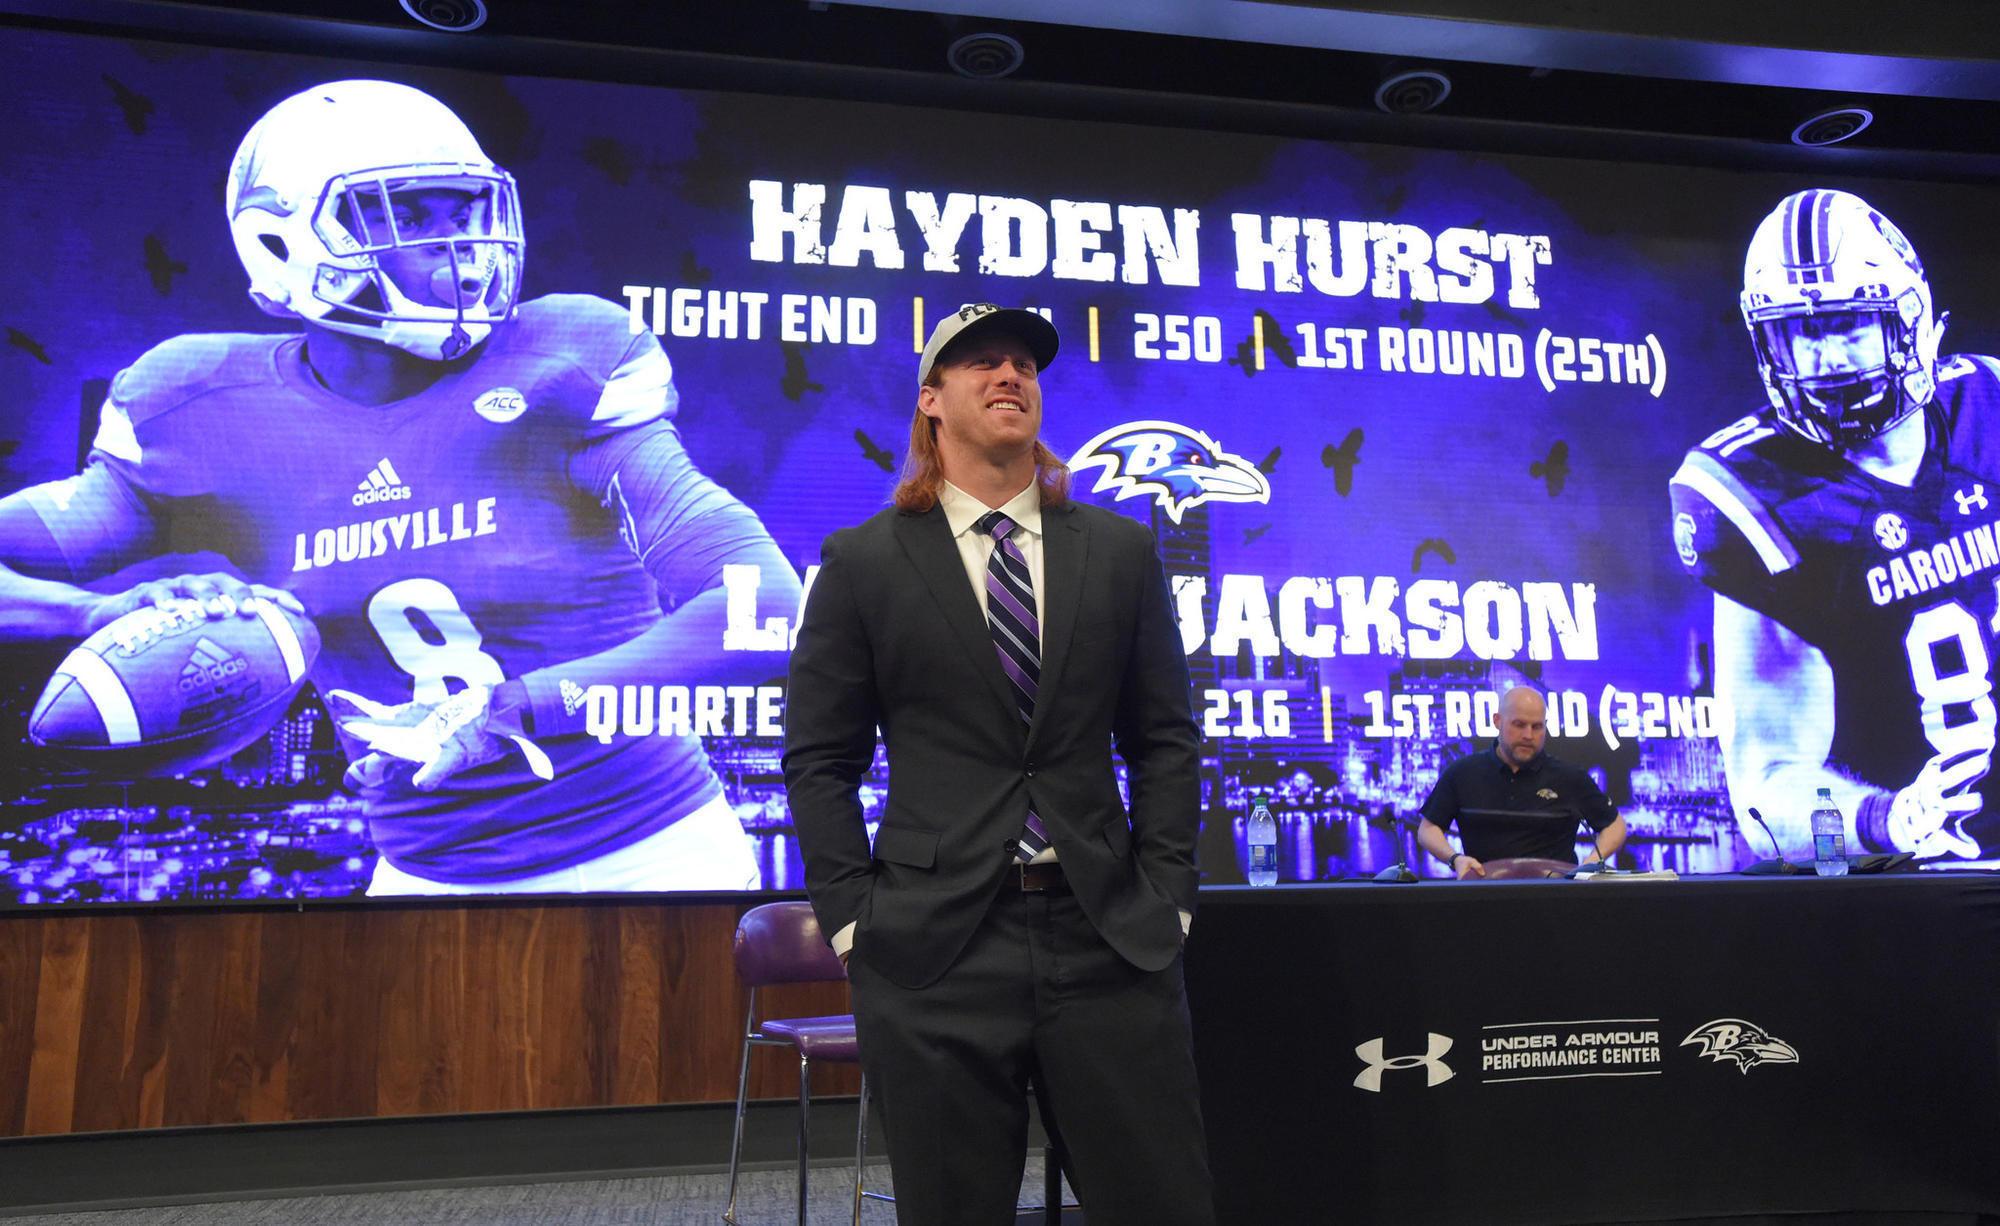 Ravens Sign hayden hurst